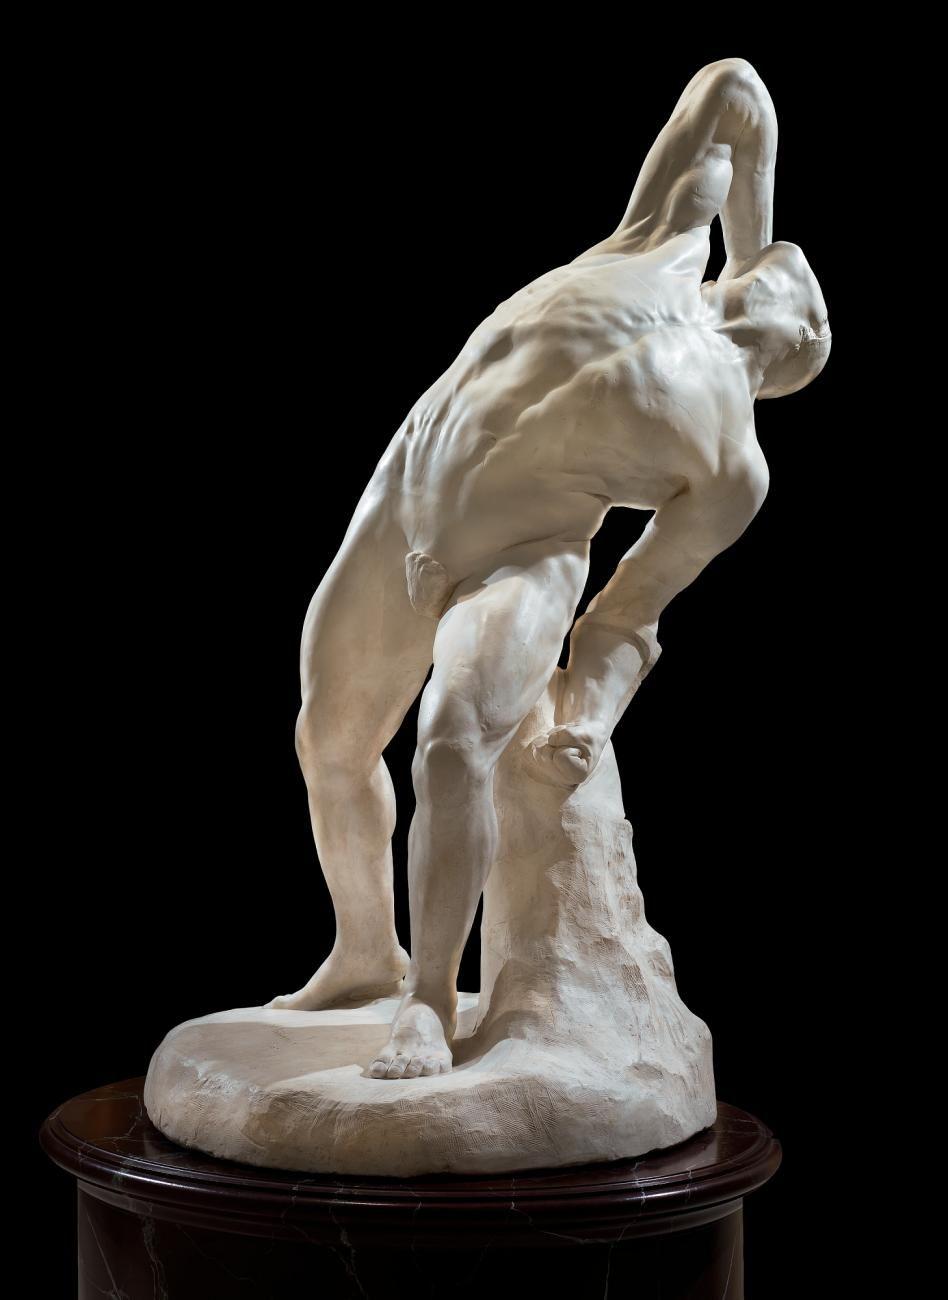 Statue of man leaning back over backward over a bolder